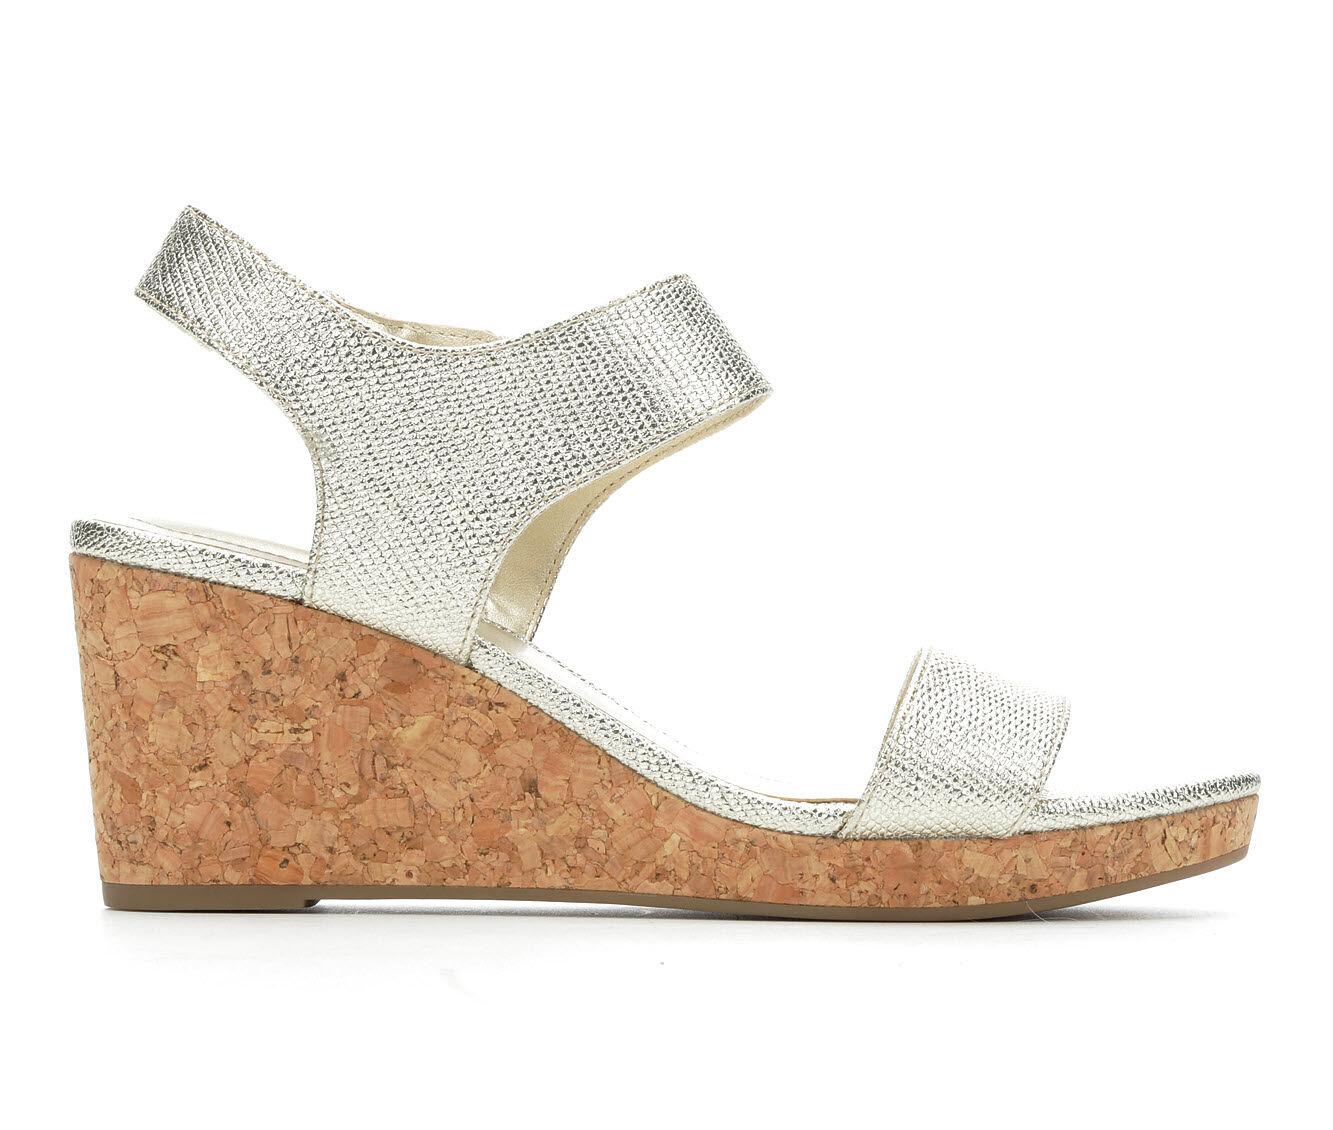 uk shoes_kd6833